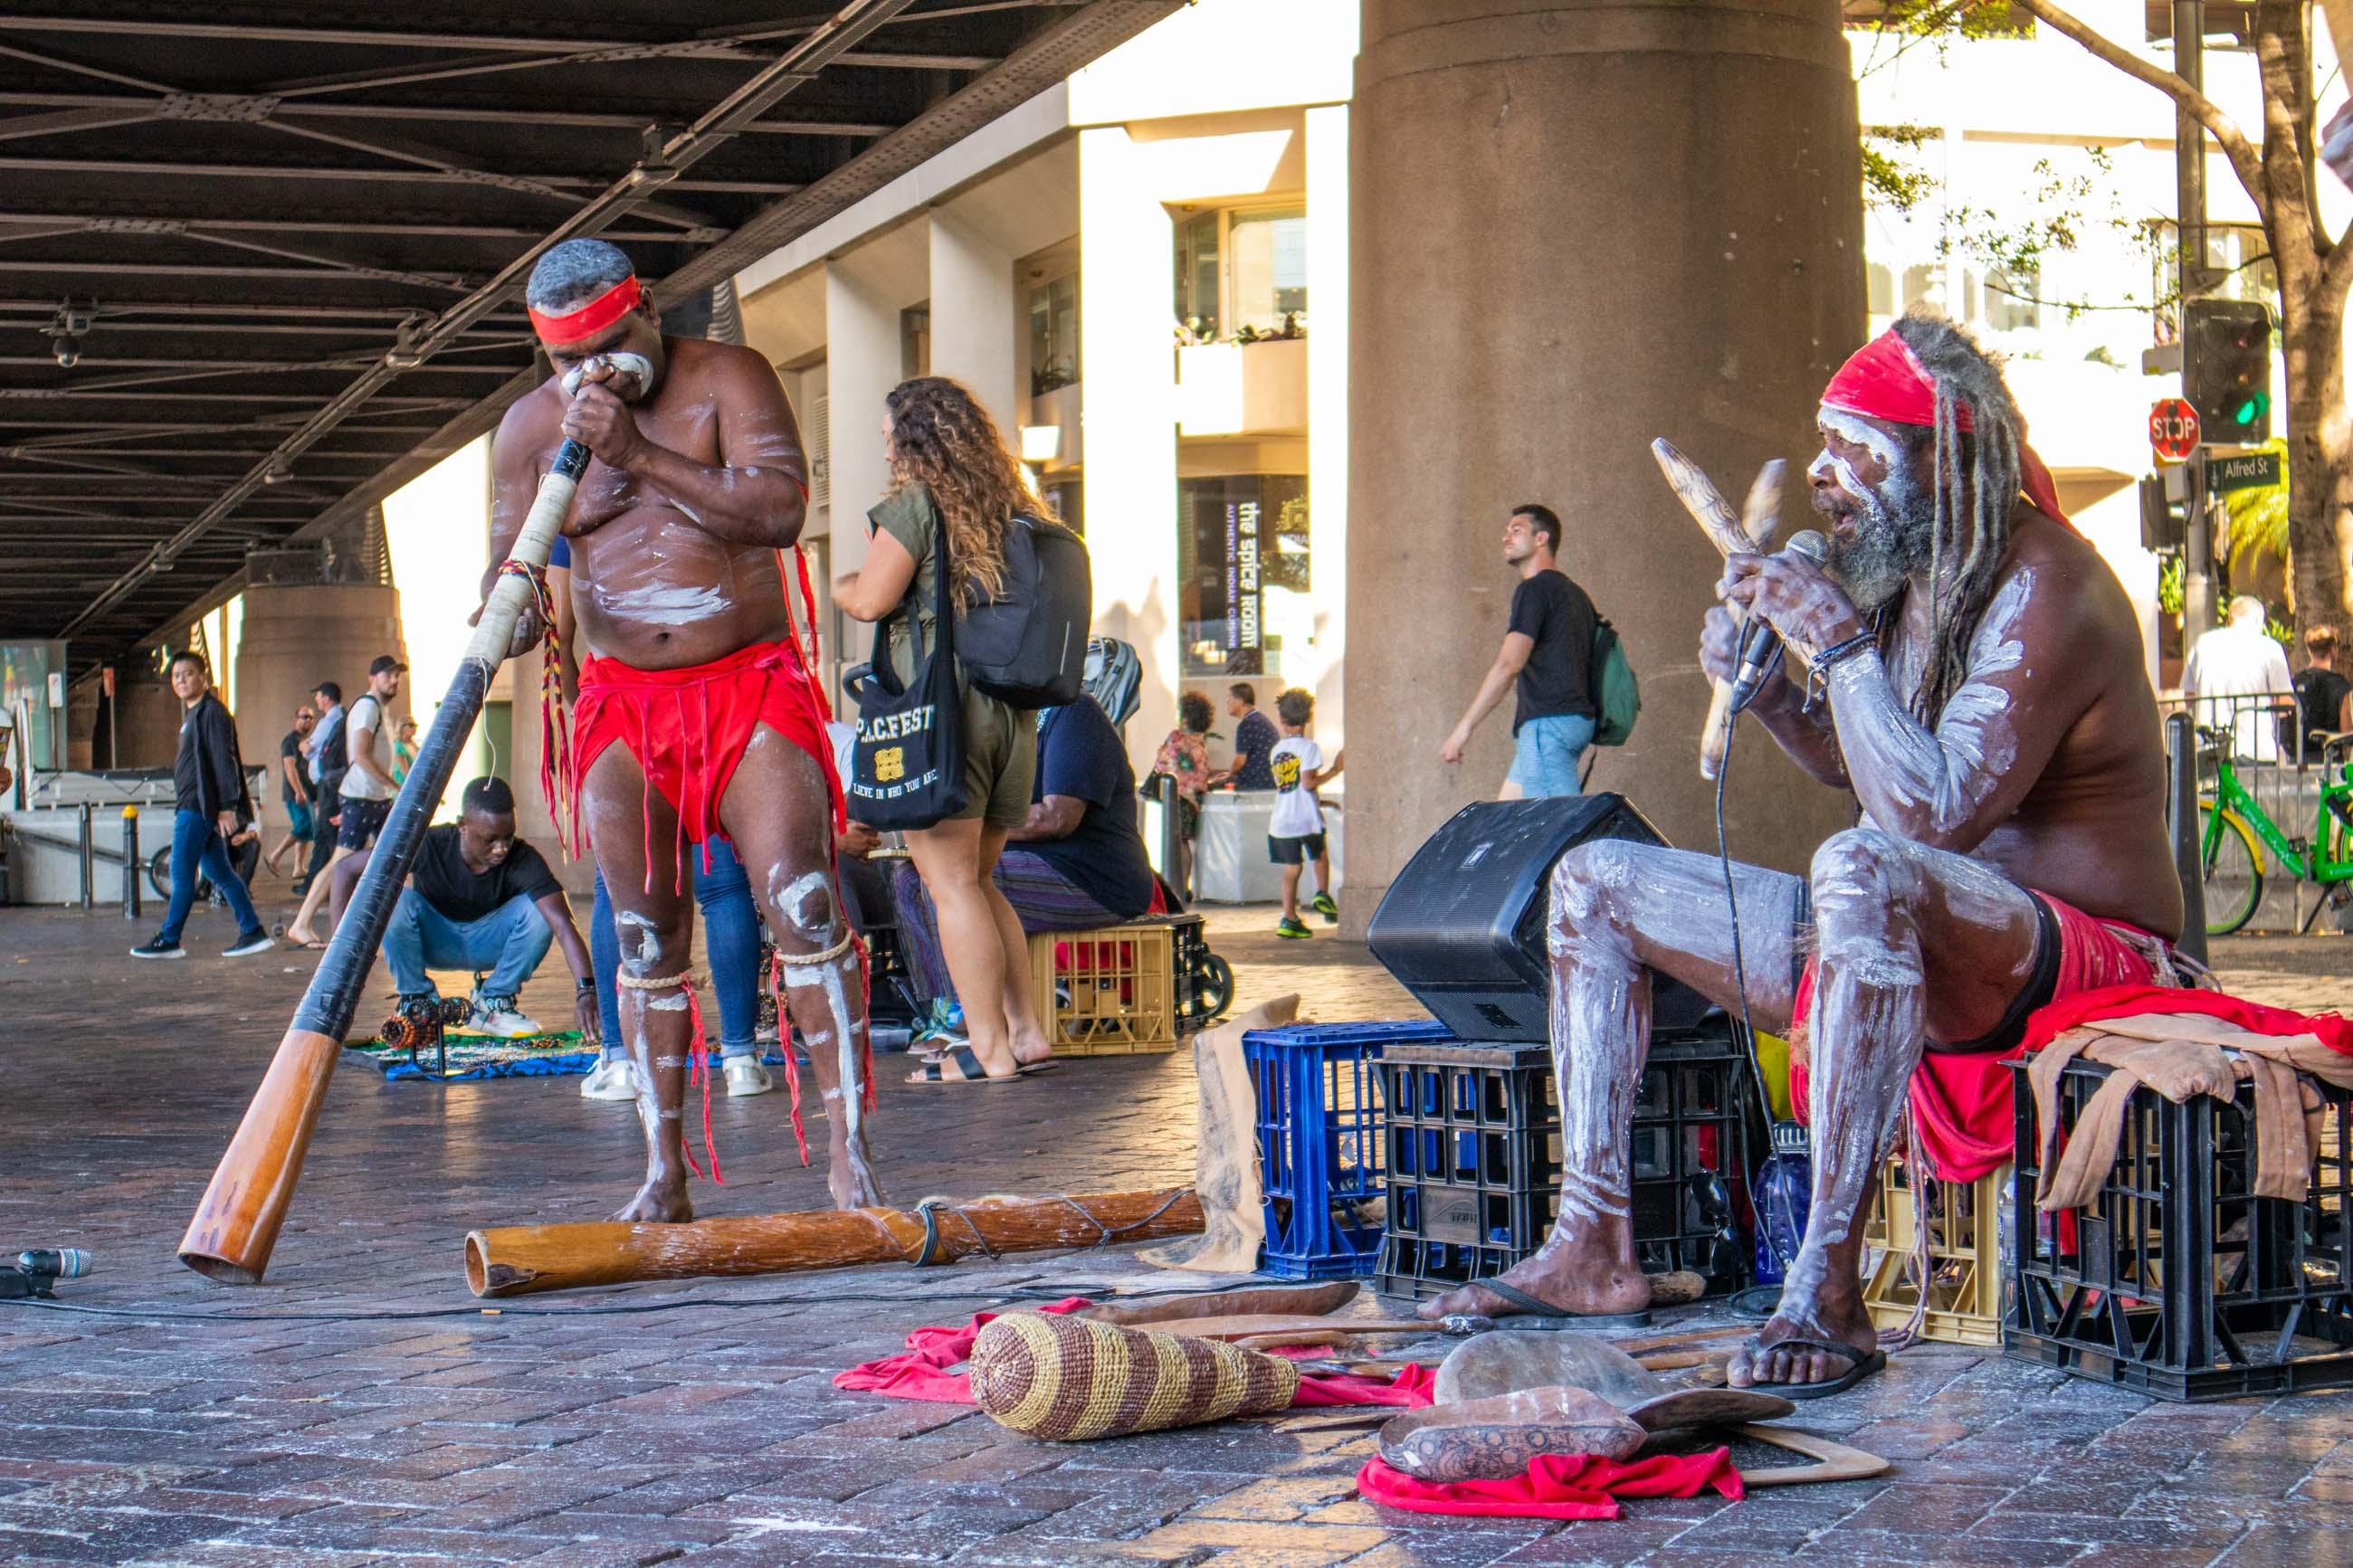 https://bubo.sk/uploads/galleries/5027/veron_hulikova_australia_sydney_circularquay_aboriginci.jpg